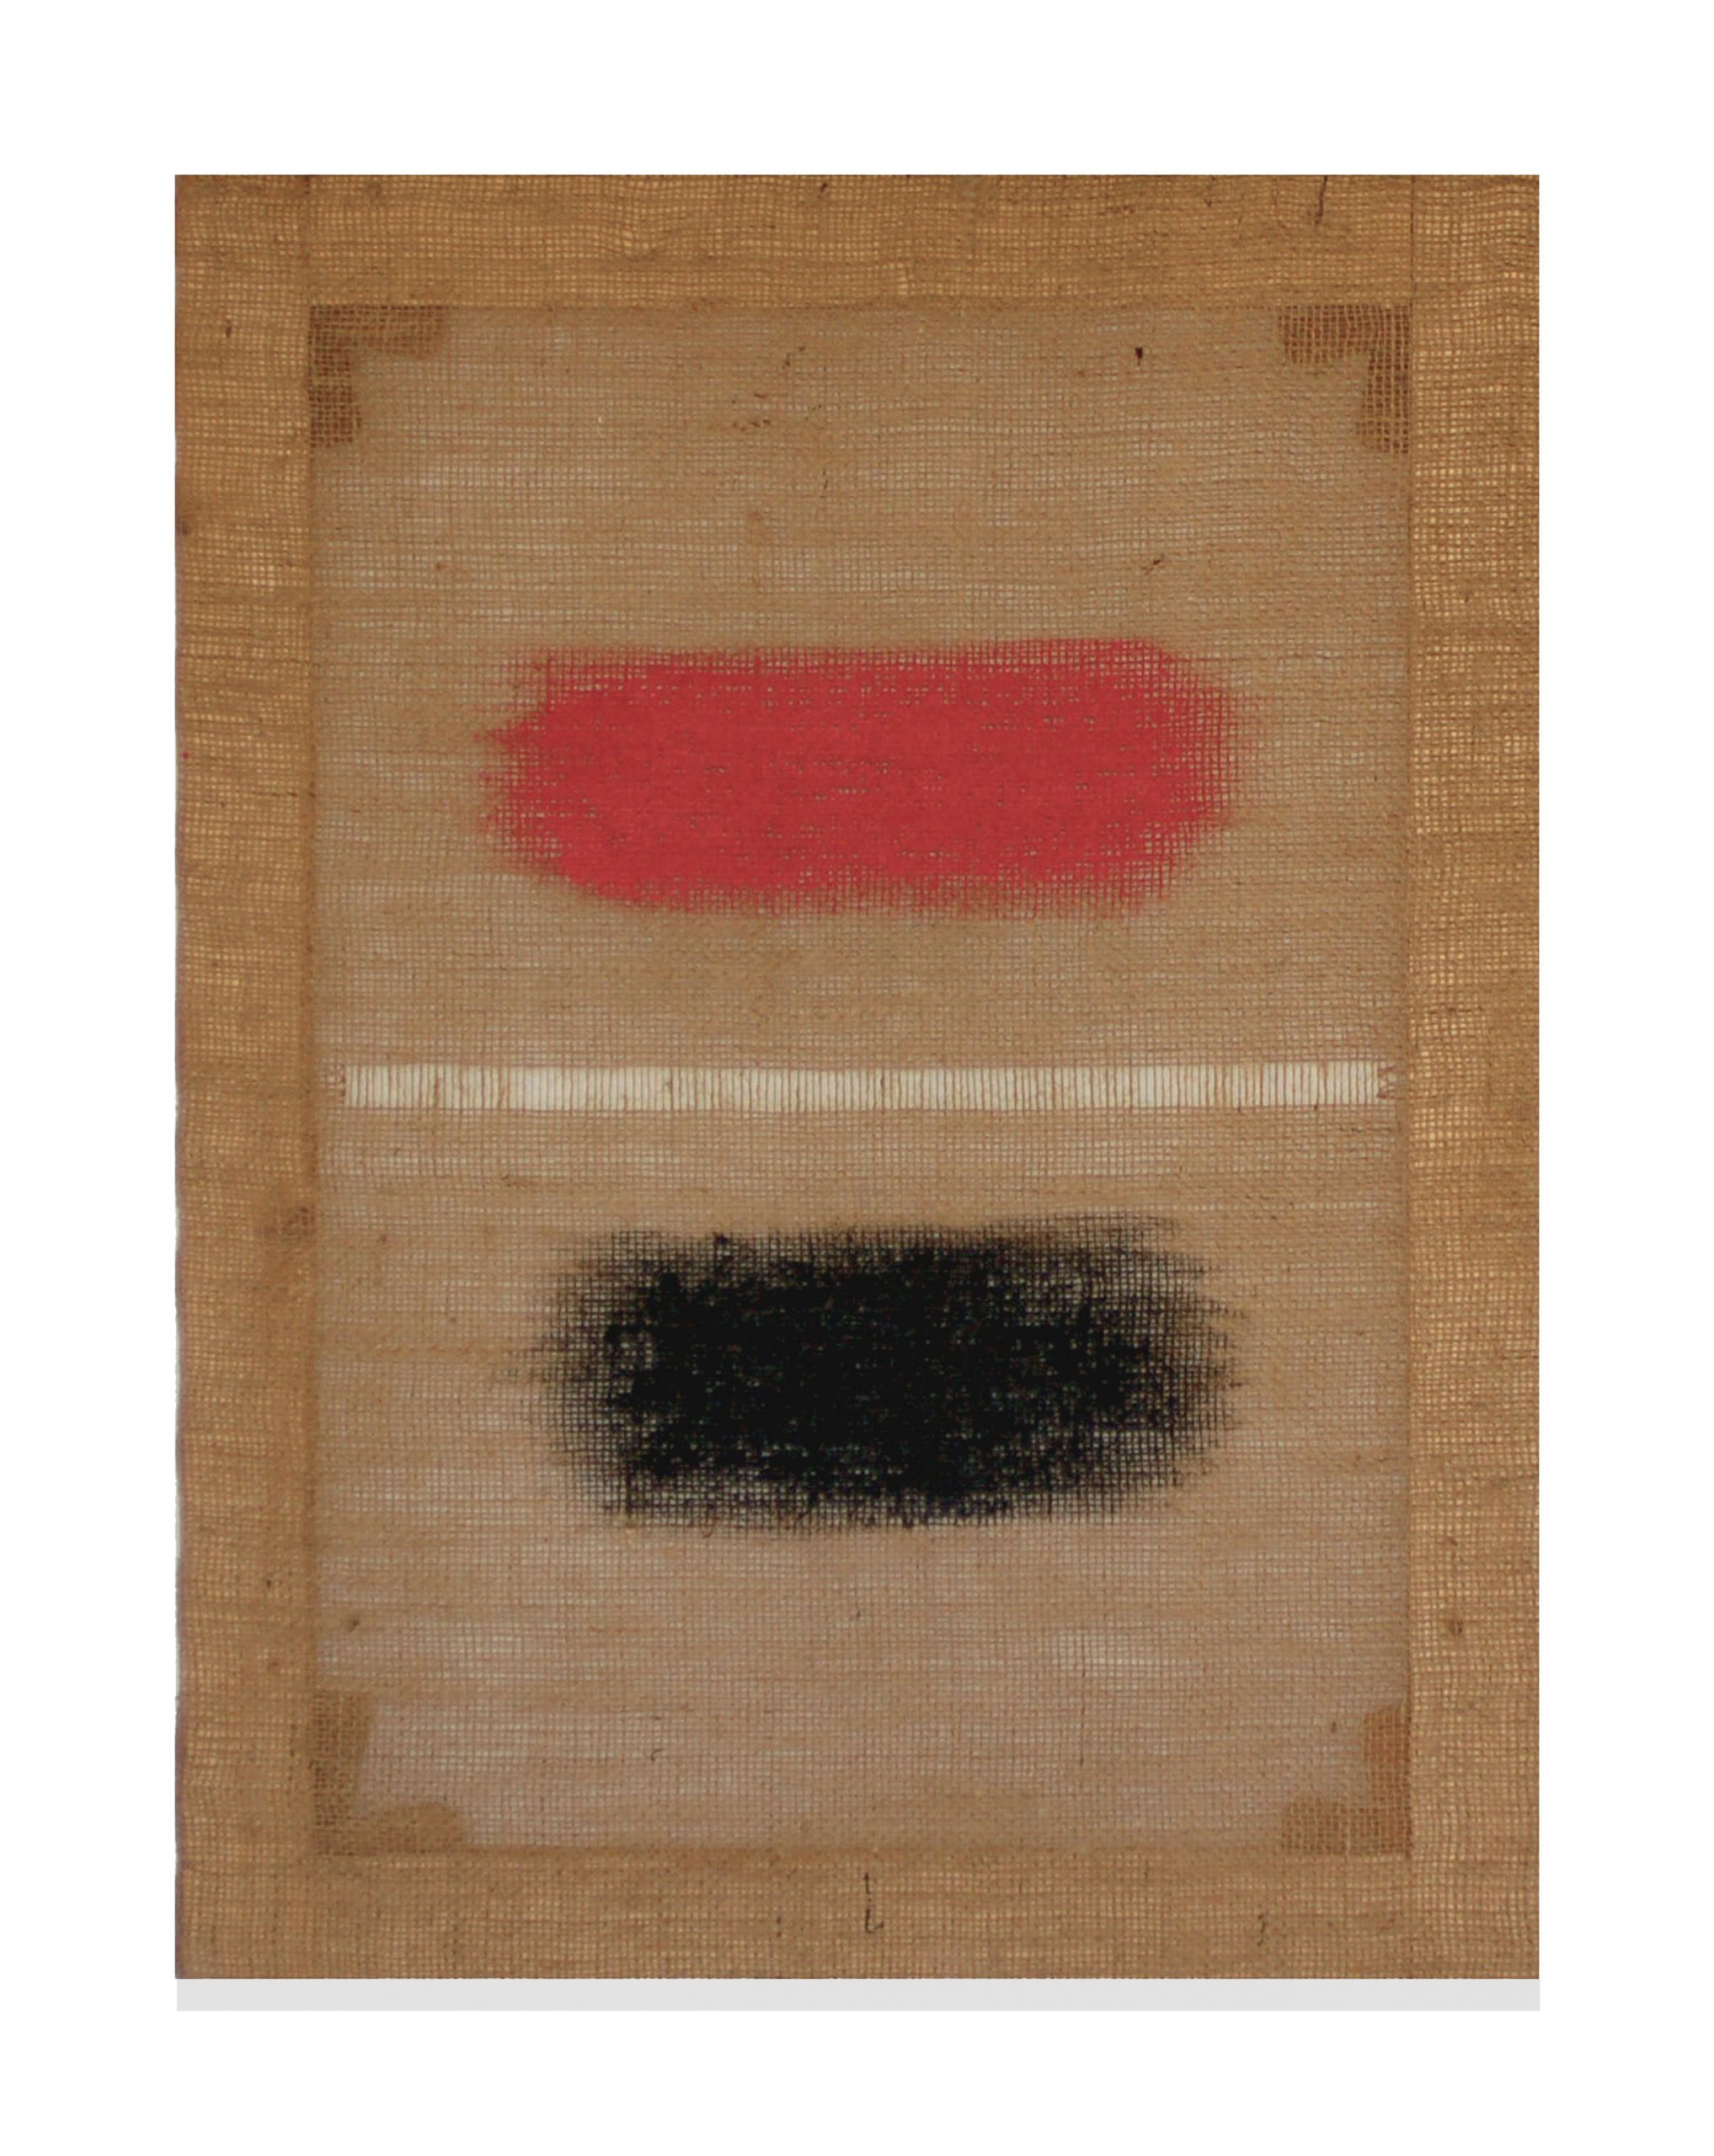 Salvatore Emblema Untitled/Senza titolo 1996 Tinted soil on dethreaded burlaup/Terre colorate su juta detessuta Cm 80 x 60 Courtesy Glenda Cinquegrana Art Consulting